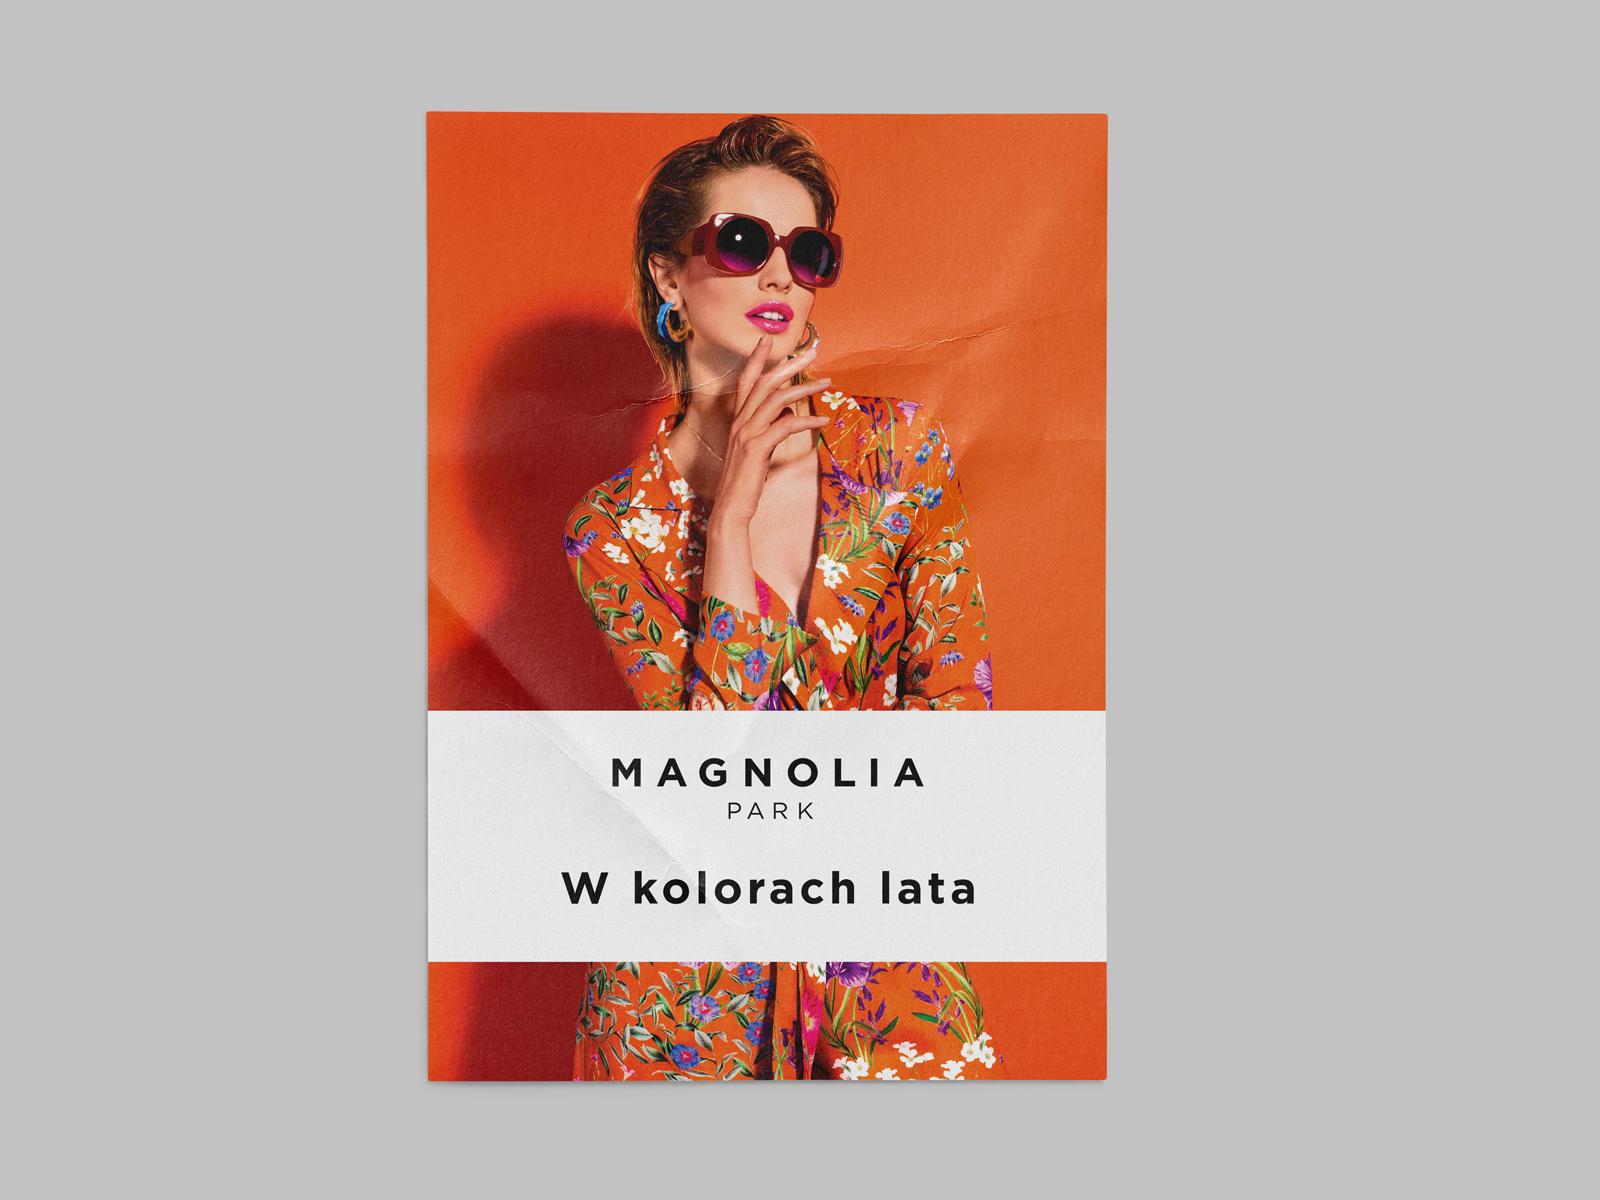 magnolia_new_1